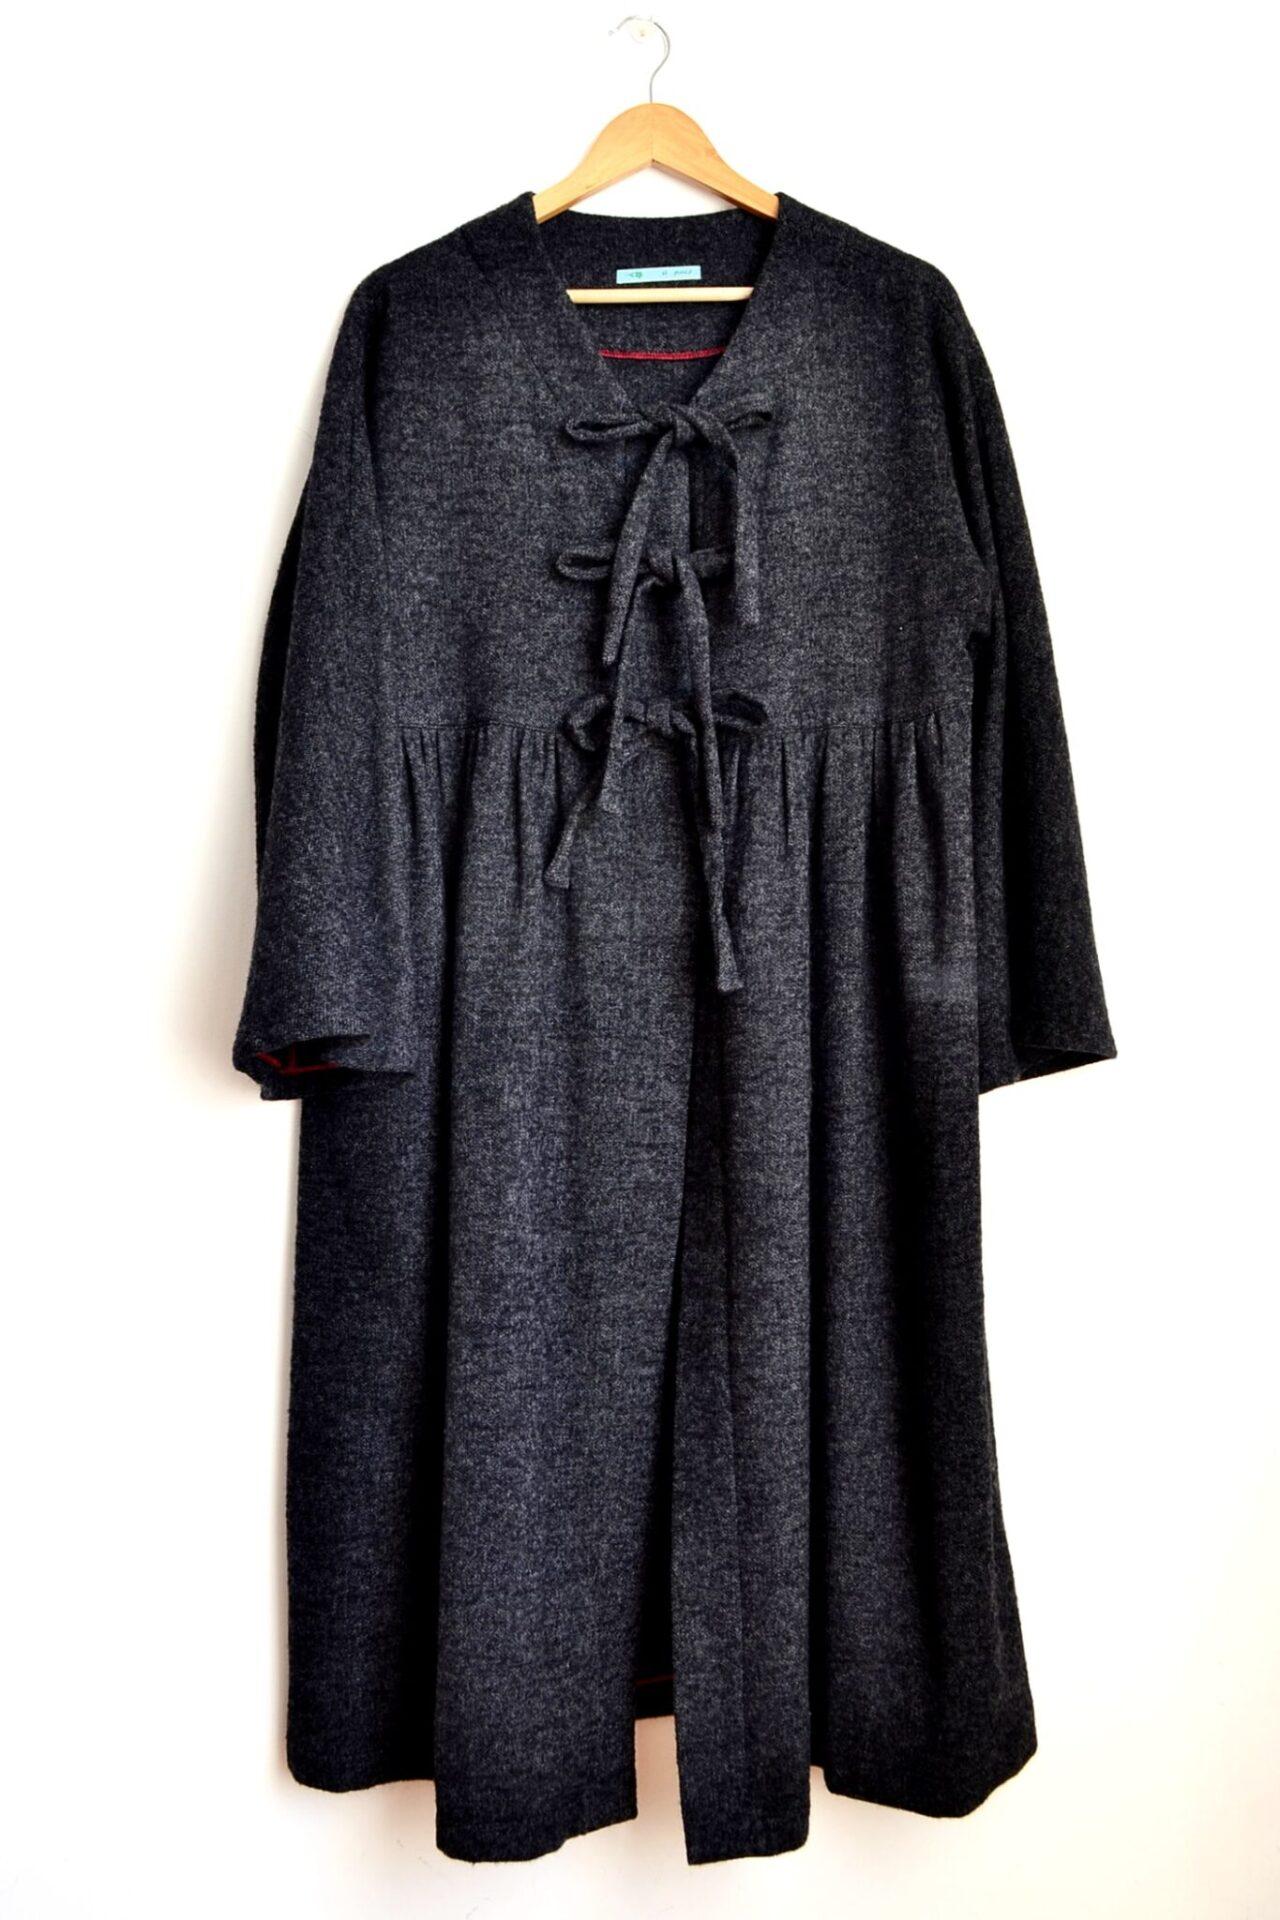 Blanket Coat, Black, Flare Sleeve By à Pois